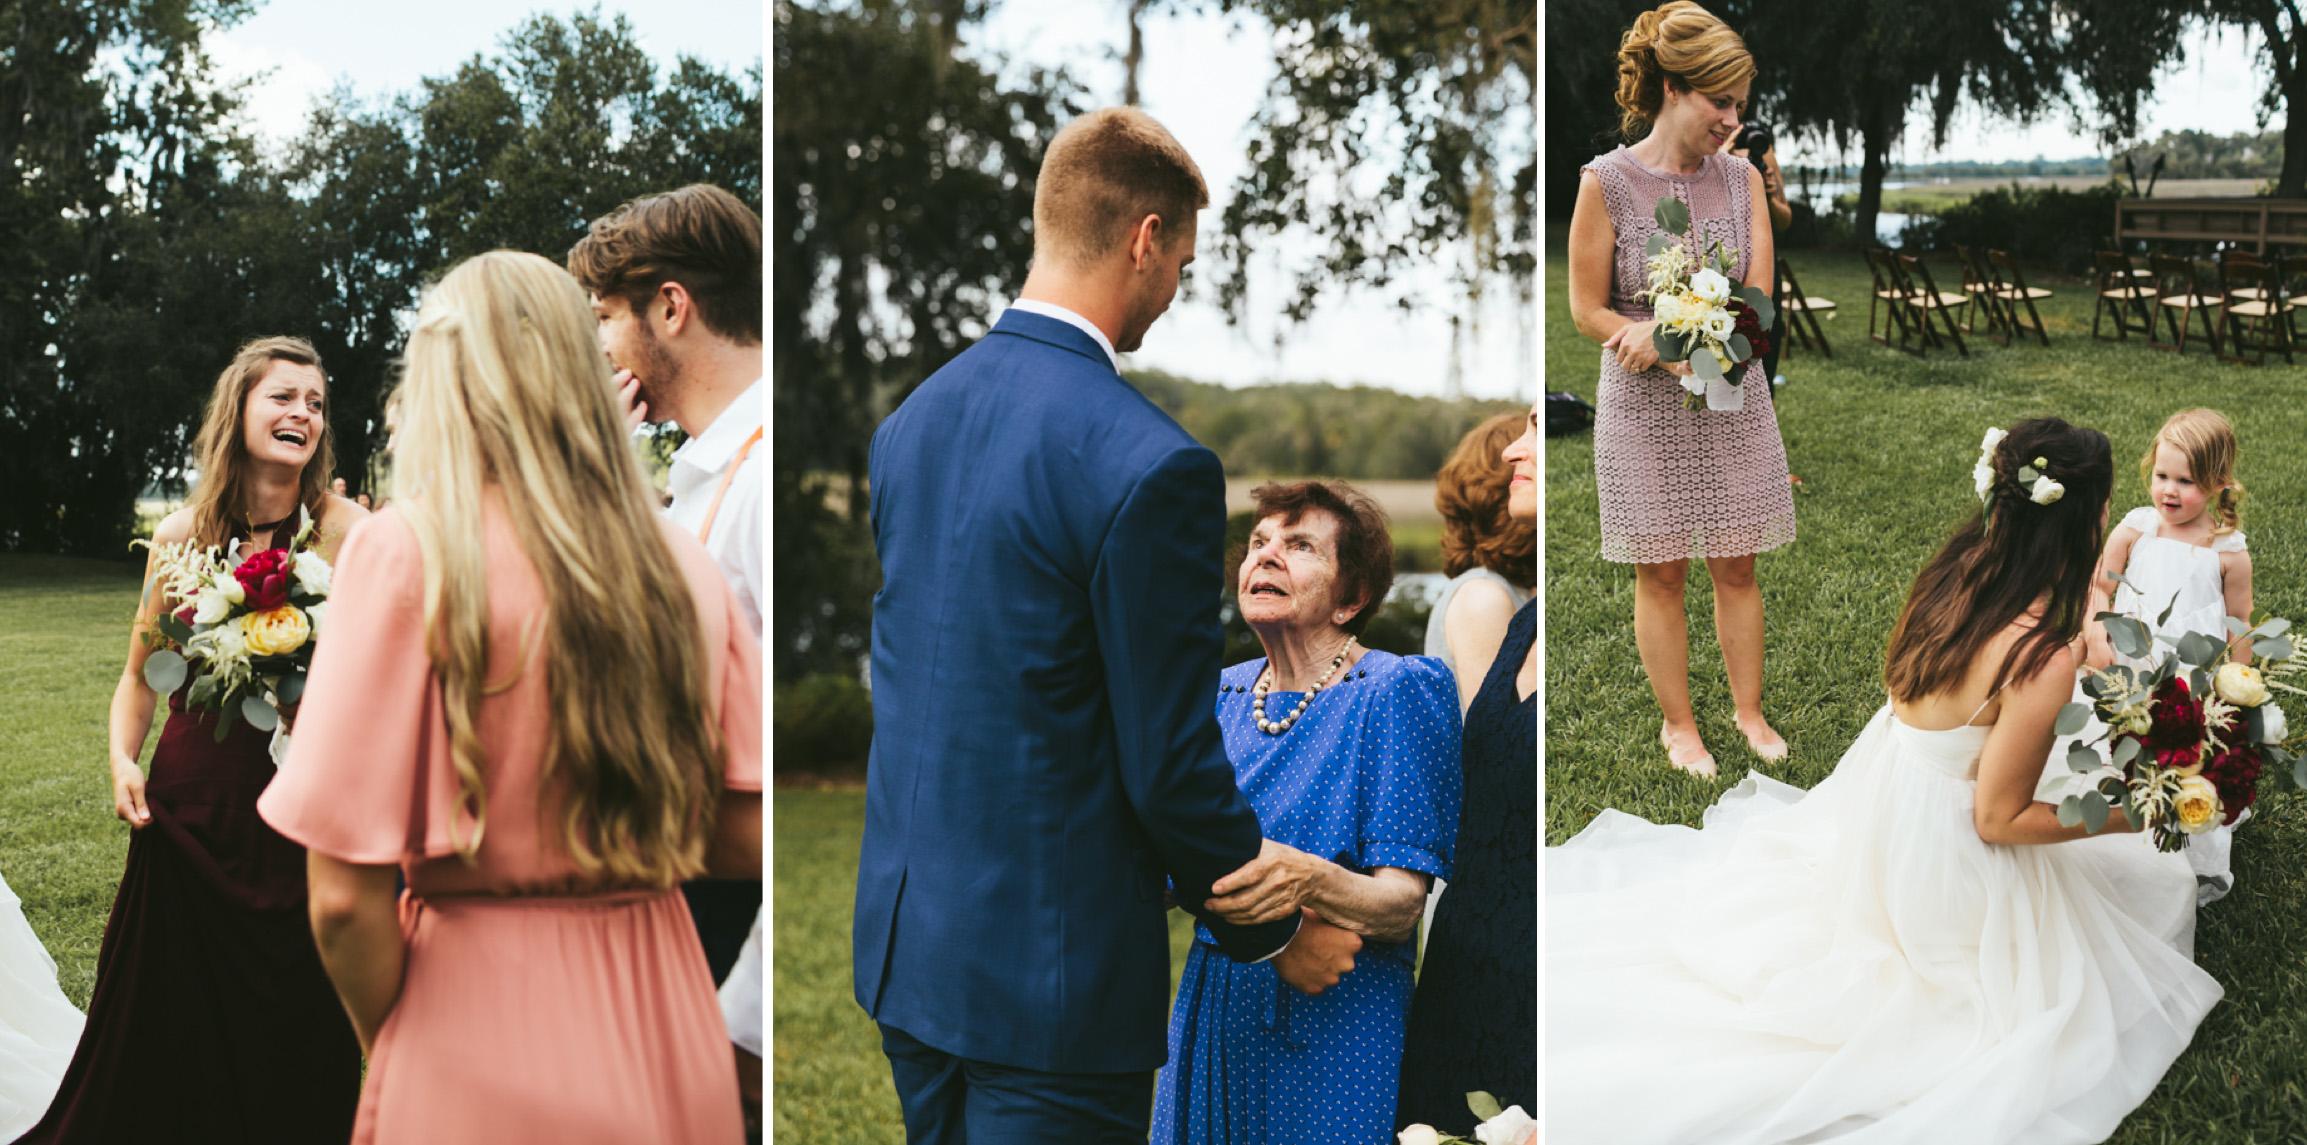 WeRomantics_MB_Wedding_Ceremony5.jpg